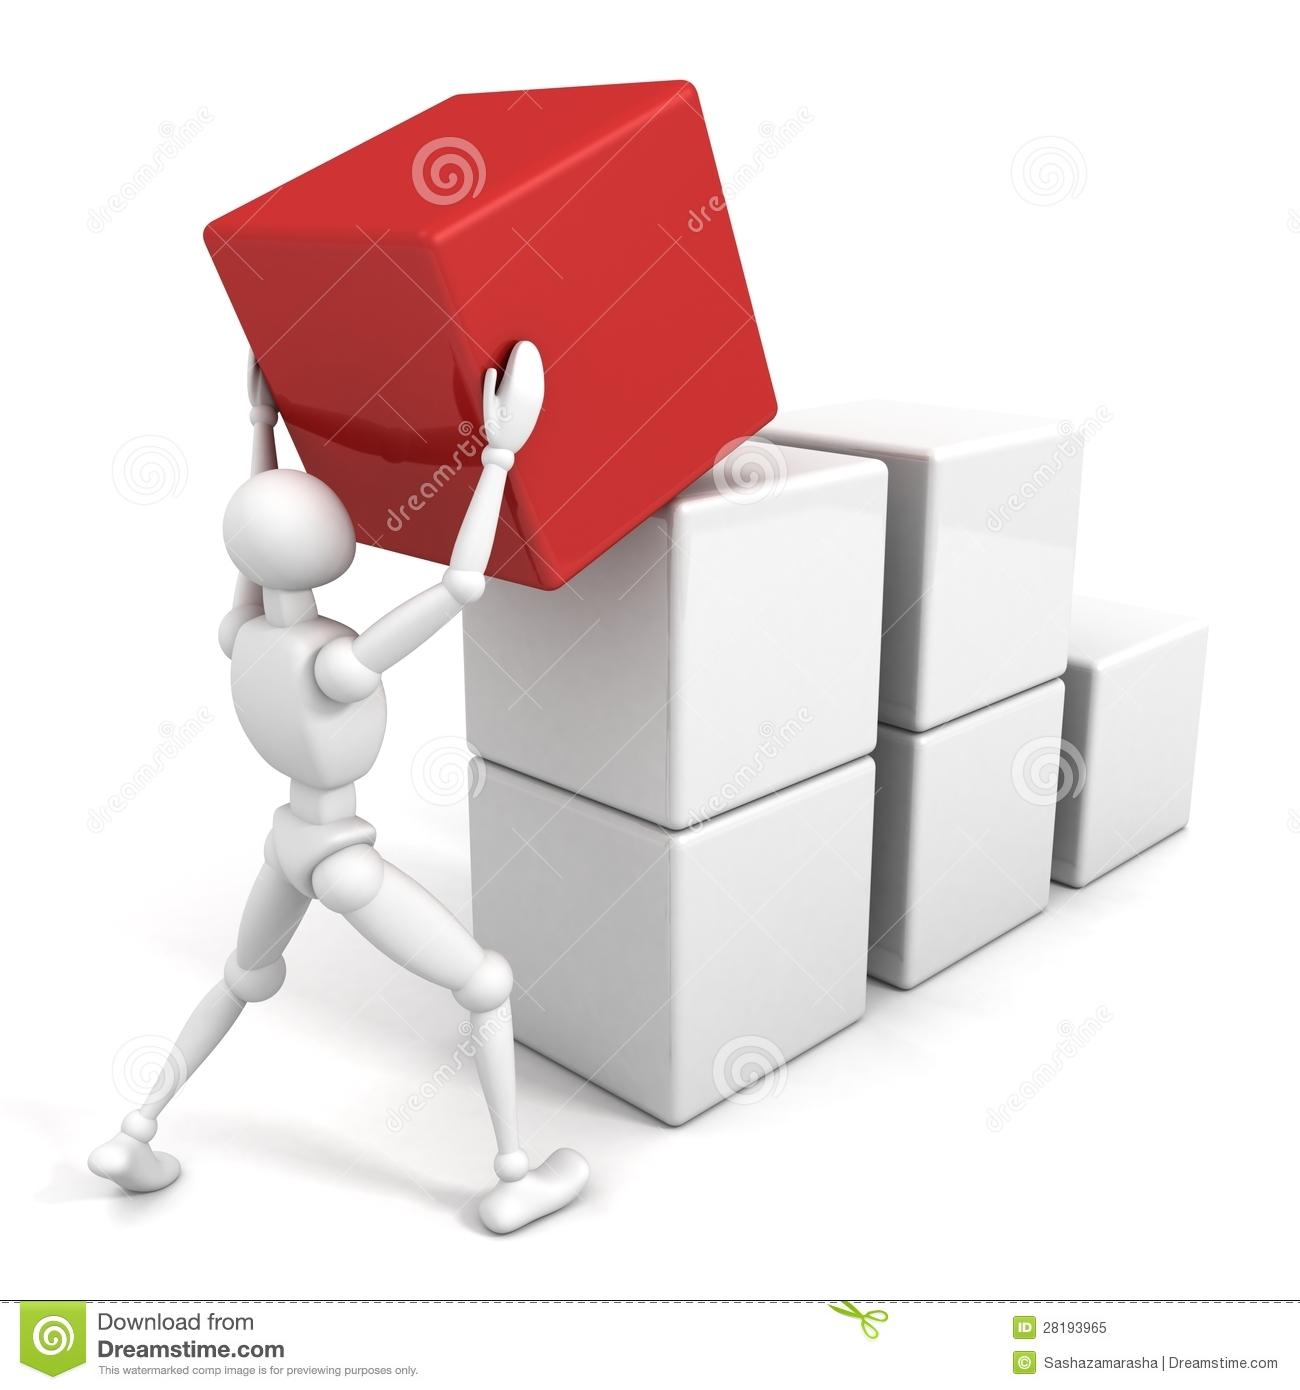 Business building blocks clipart transparent stock Business Building Blocks Stock Image - Image: 2340941 transparent stock